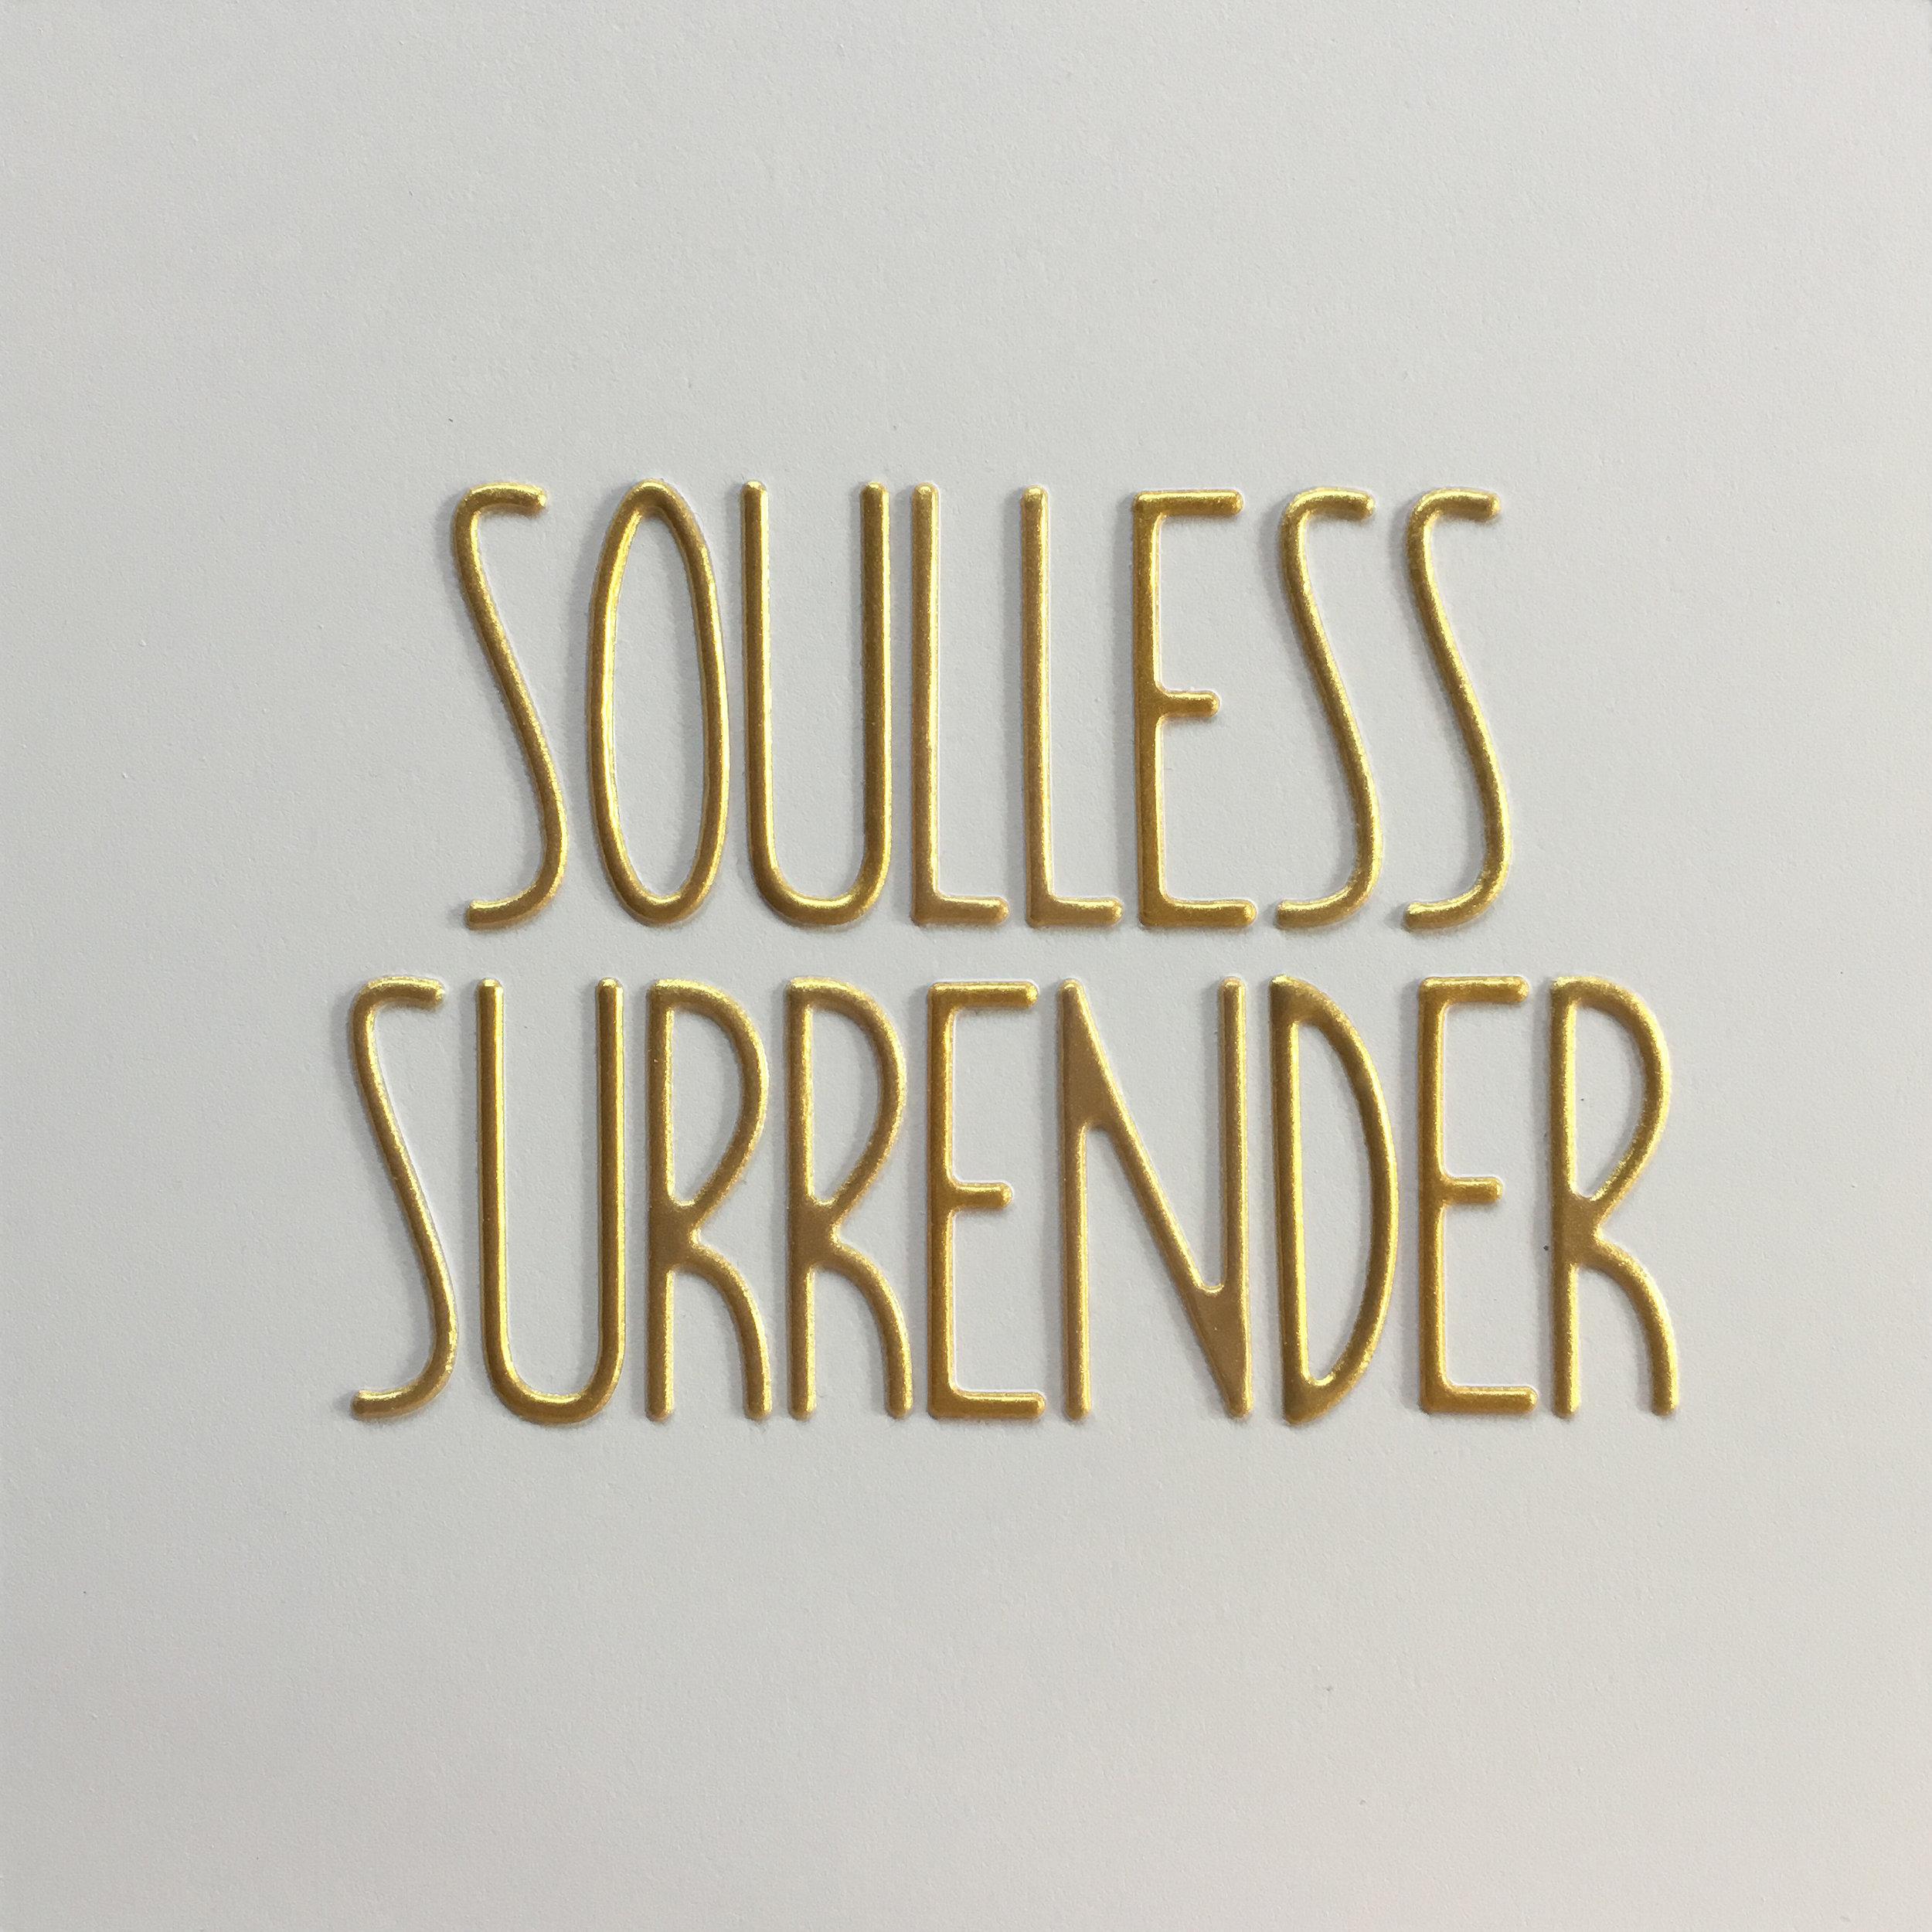 soulless surrender.jpg